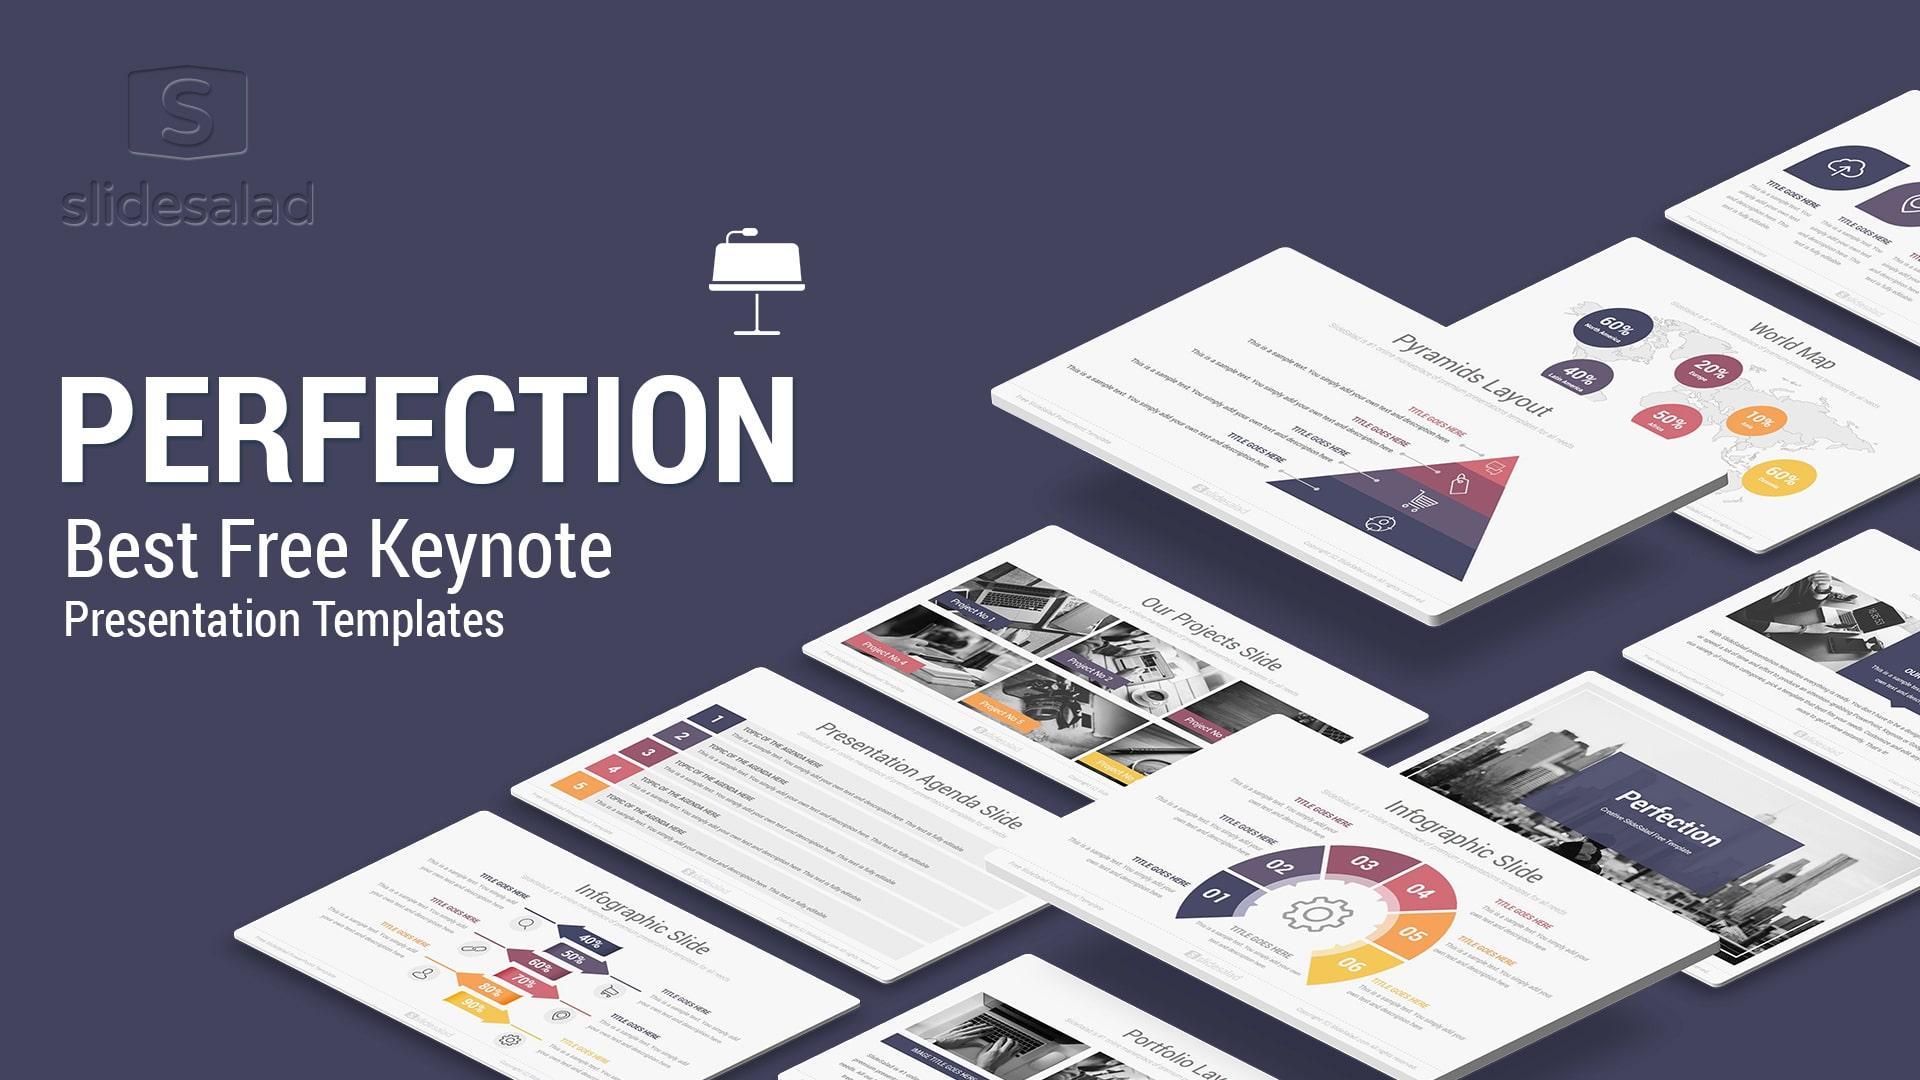 Perfection Free Keynote Presentation Template - Free Download